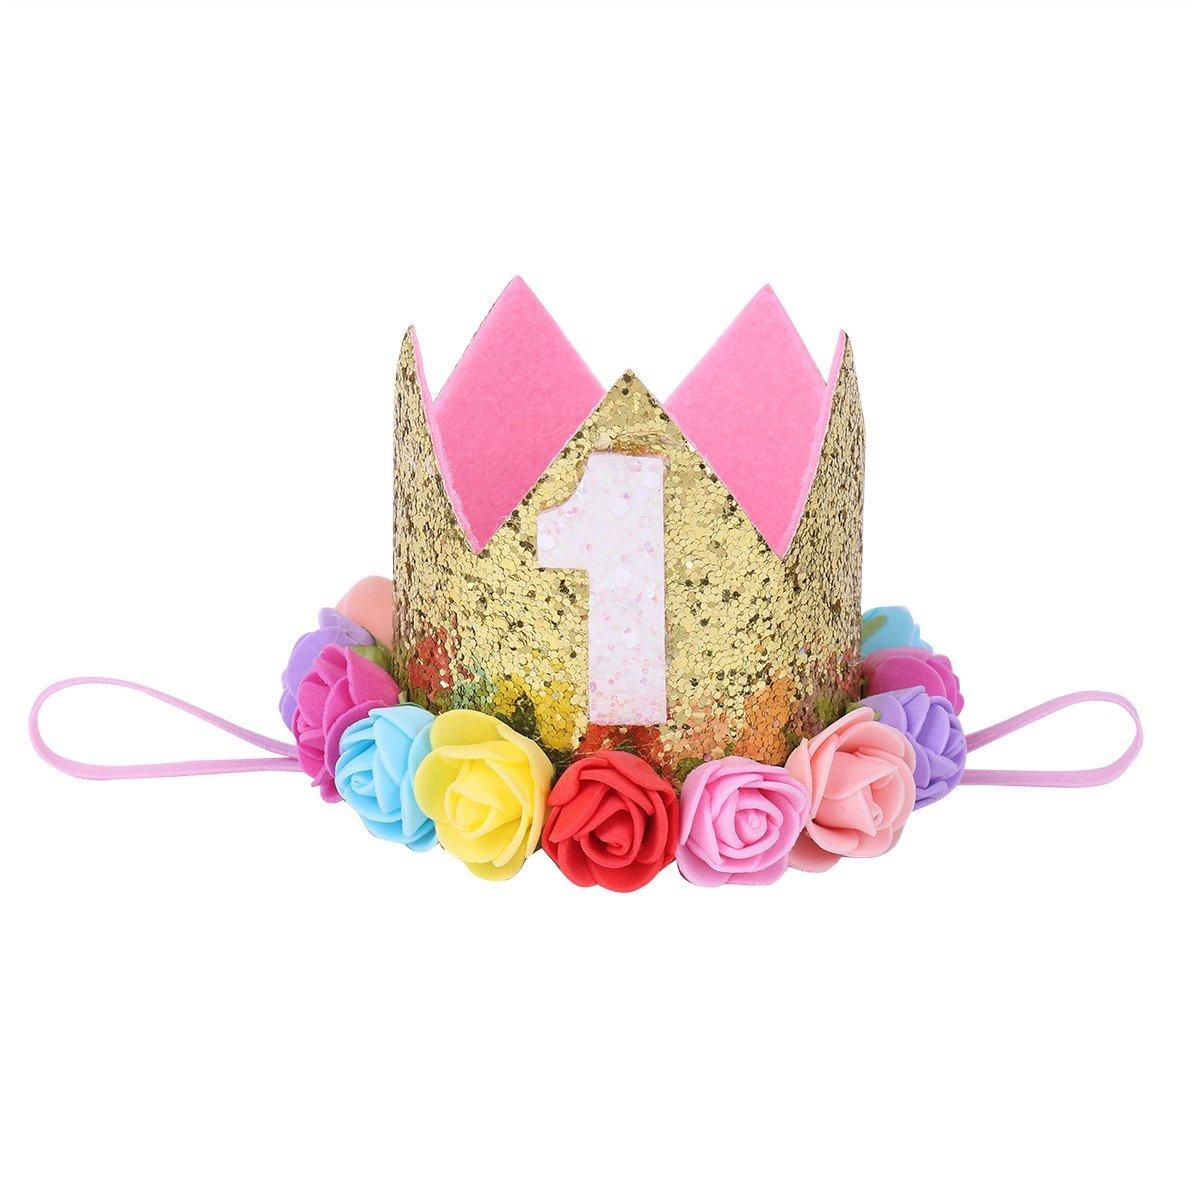 Freebily Infant Baby Girls 1st Birthday Hair Band Festival Party Hat Princess Crown Rose Flower Tiara Headband